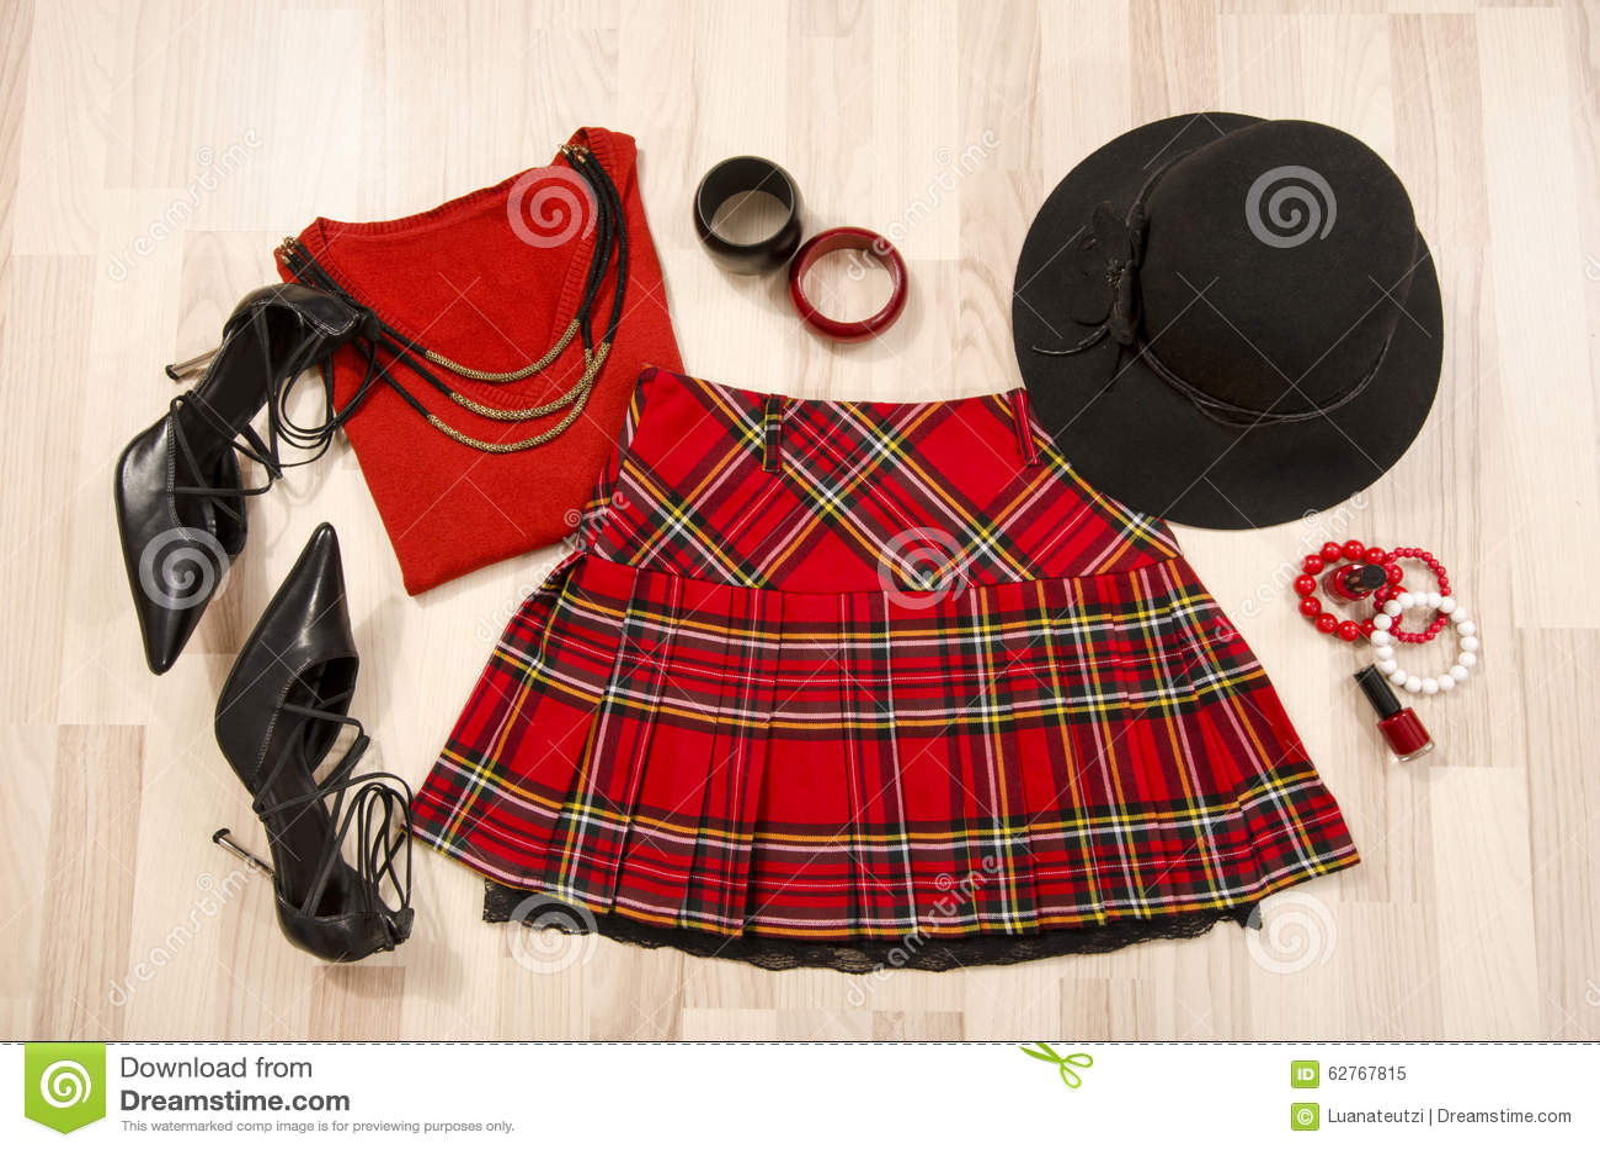 dd7222bf41f5 Η κόκκινη εξάρτηση γυναικών με το ταίριασμα της στιλβωτικής ουσίας καπέλων